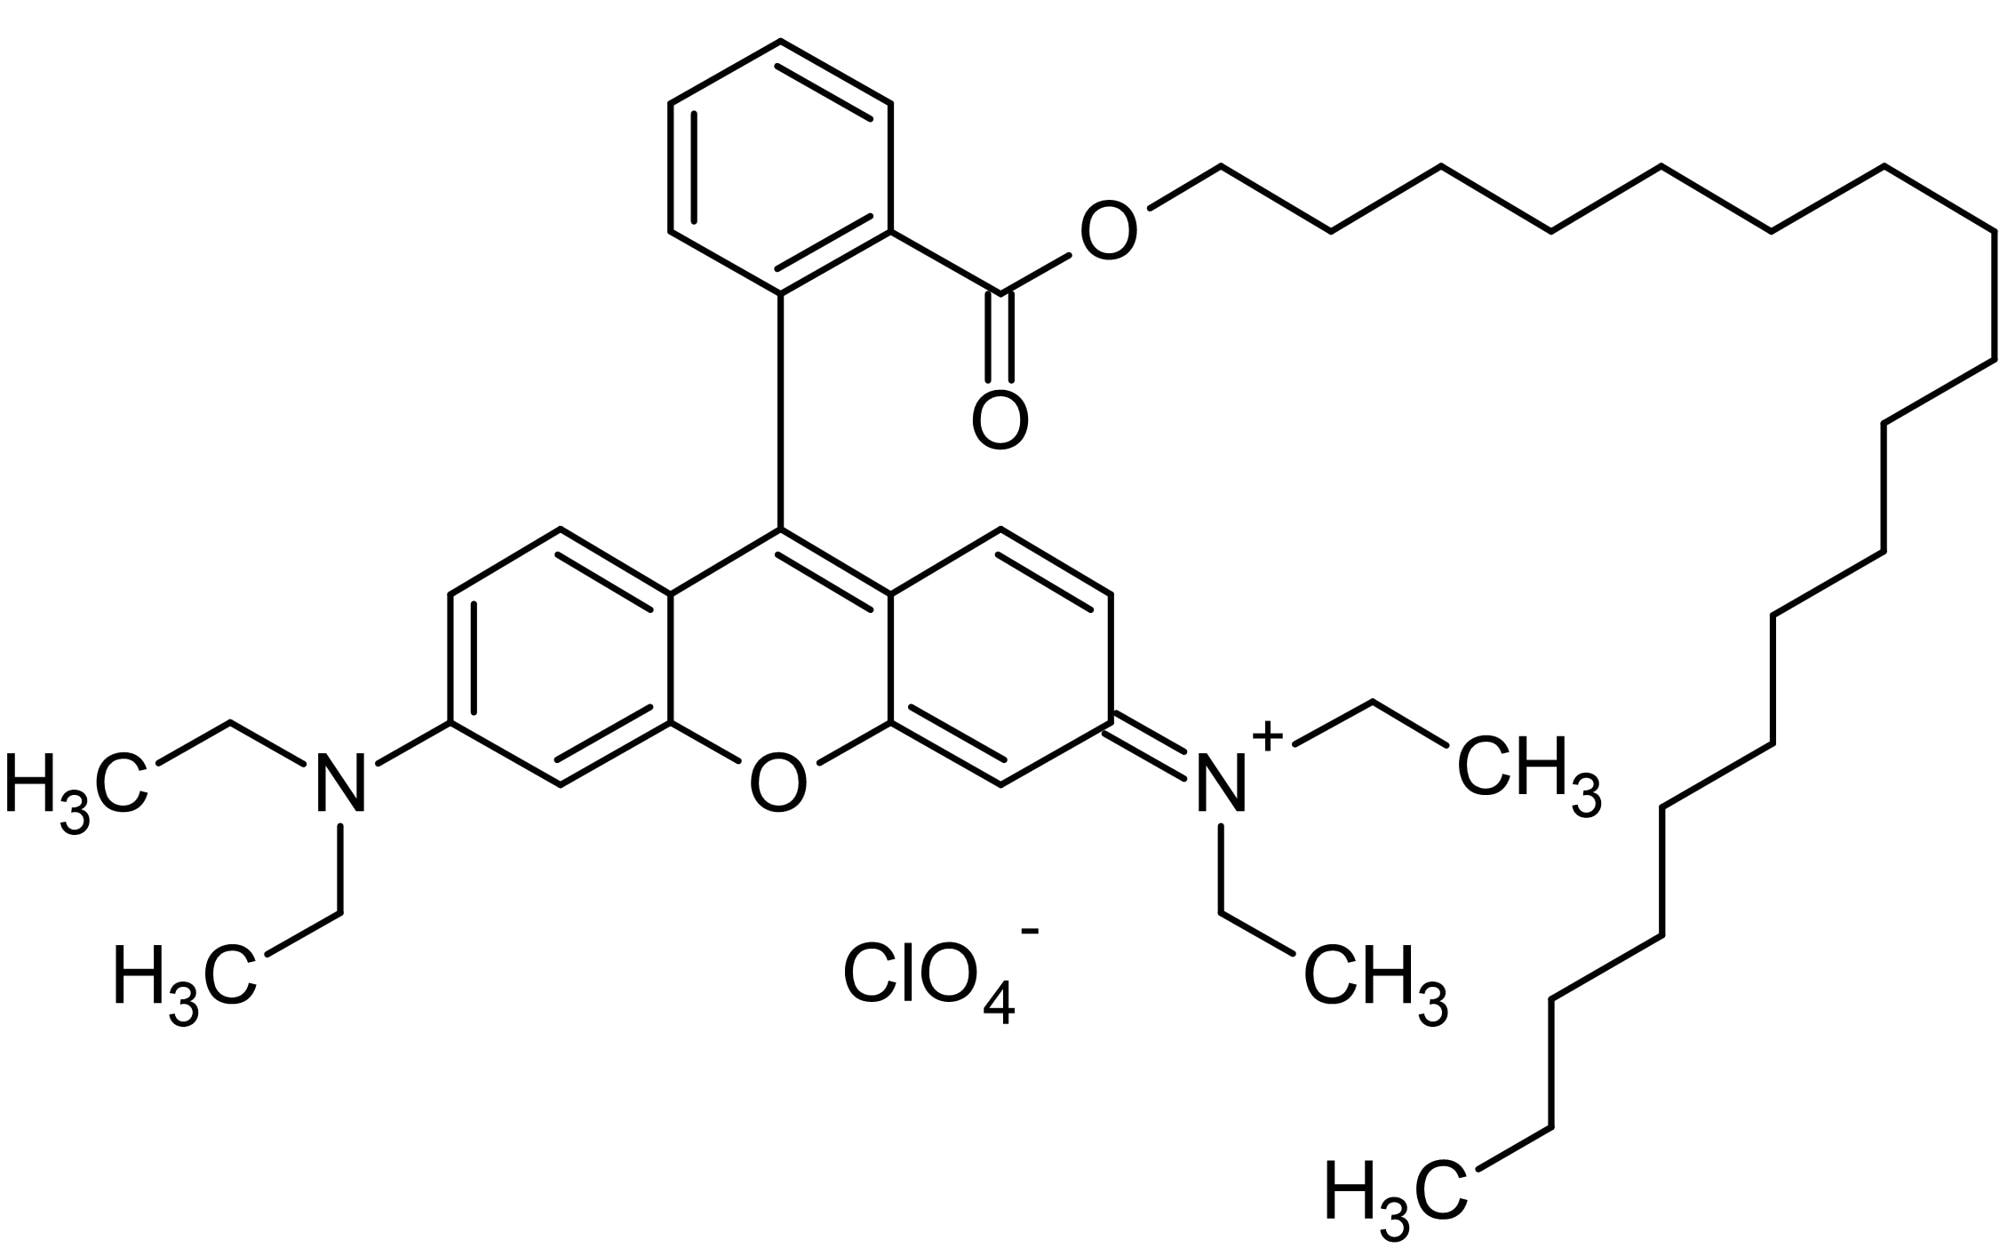 Chemical Structure - Rhodamine B octadecyl ester perchlorate, Lipophilic energy transfer acceptor (ab145364)